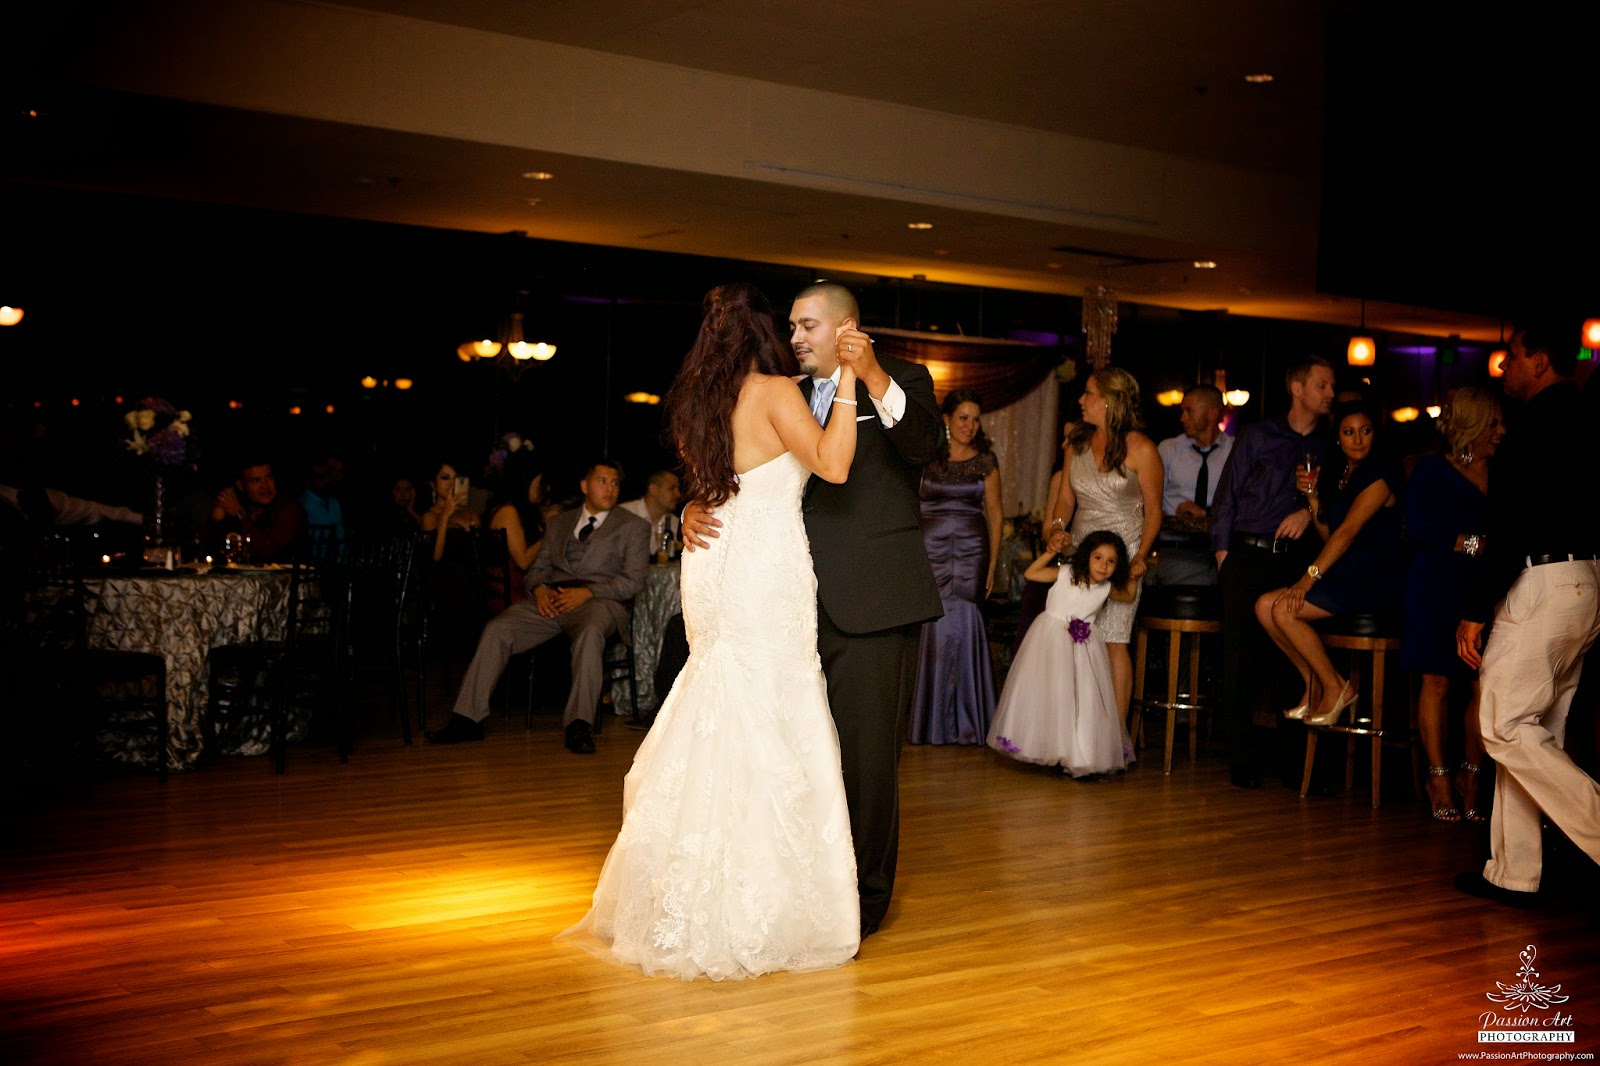 Passion Art Photography: Sneak Peek! Suleyma & Edgar\'s Wedding ...